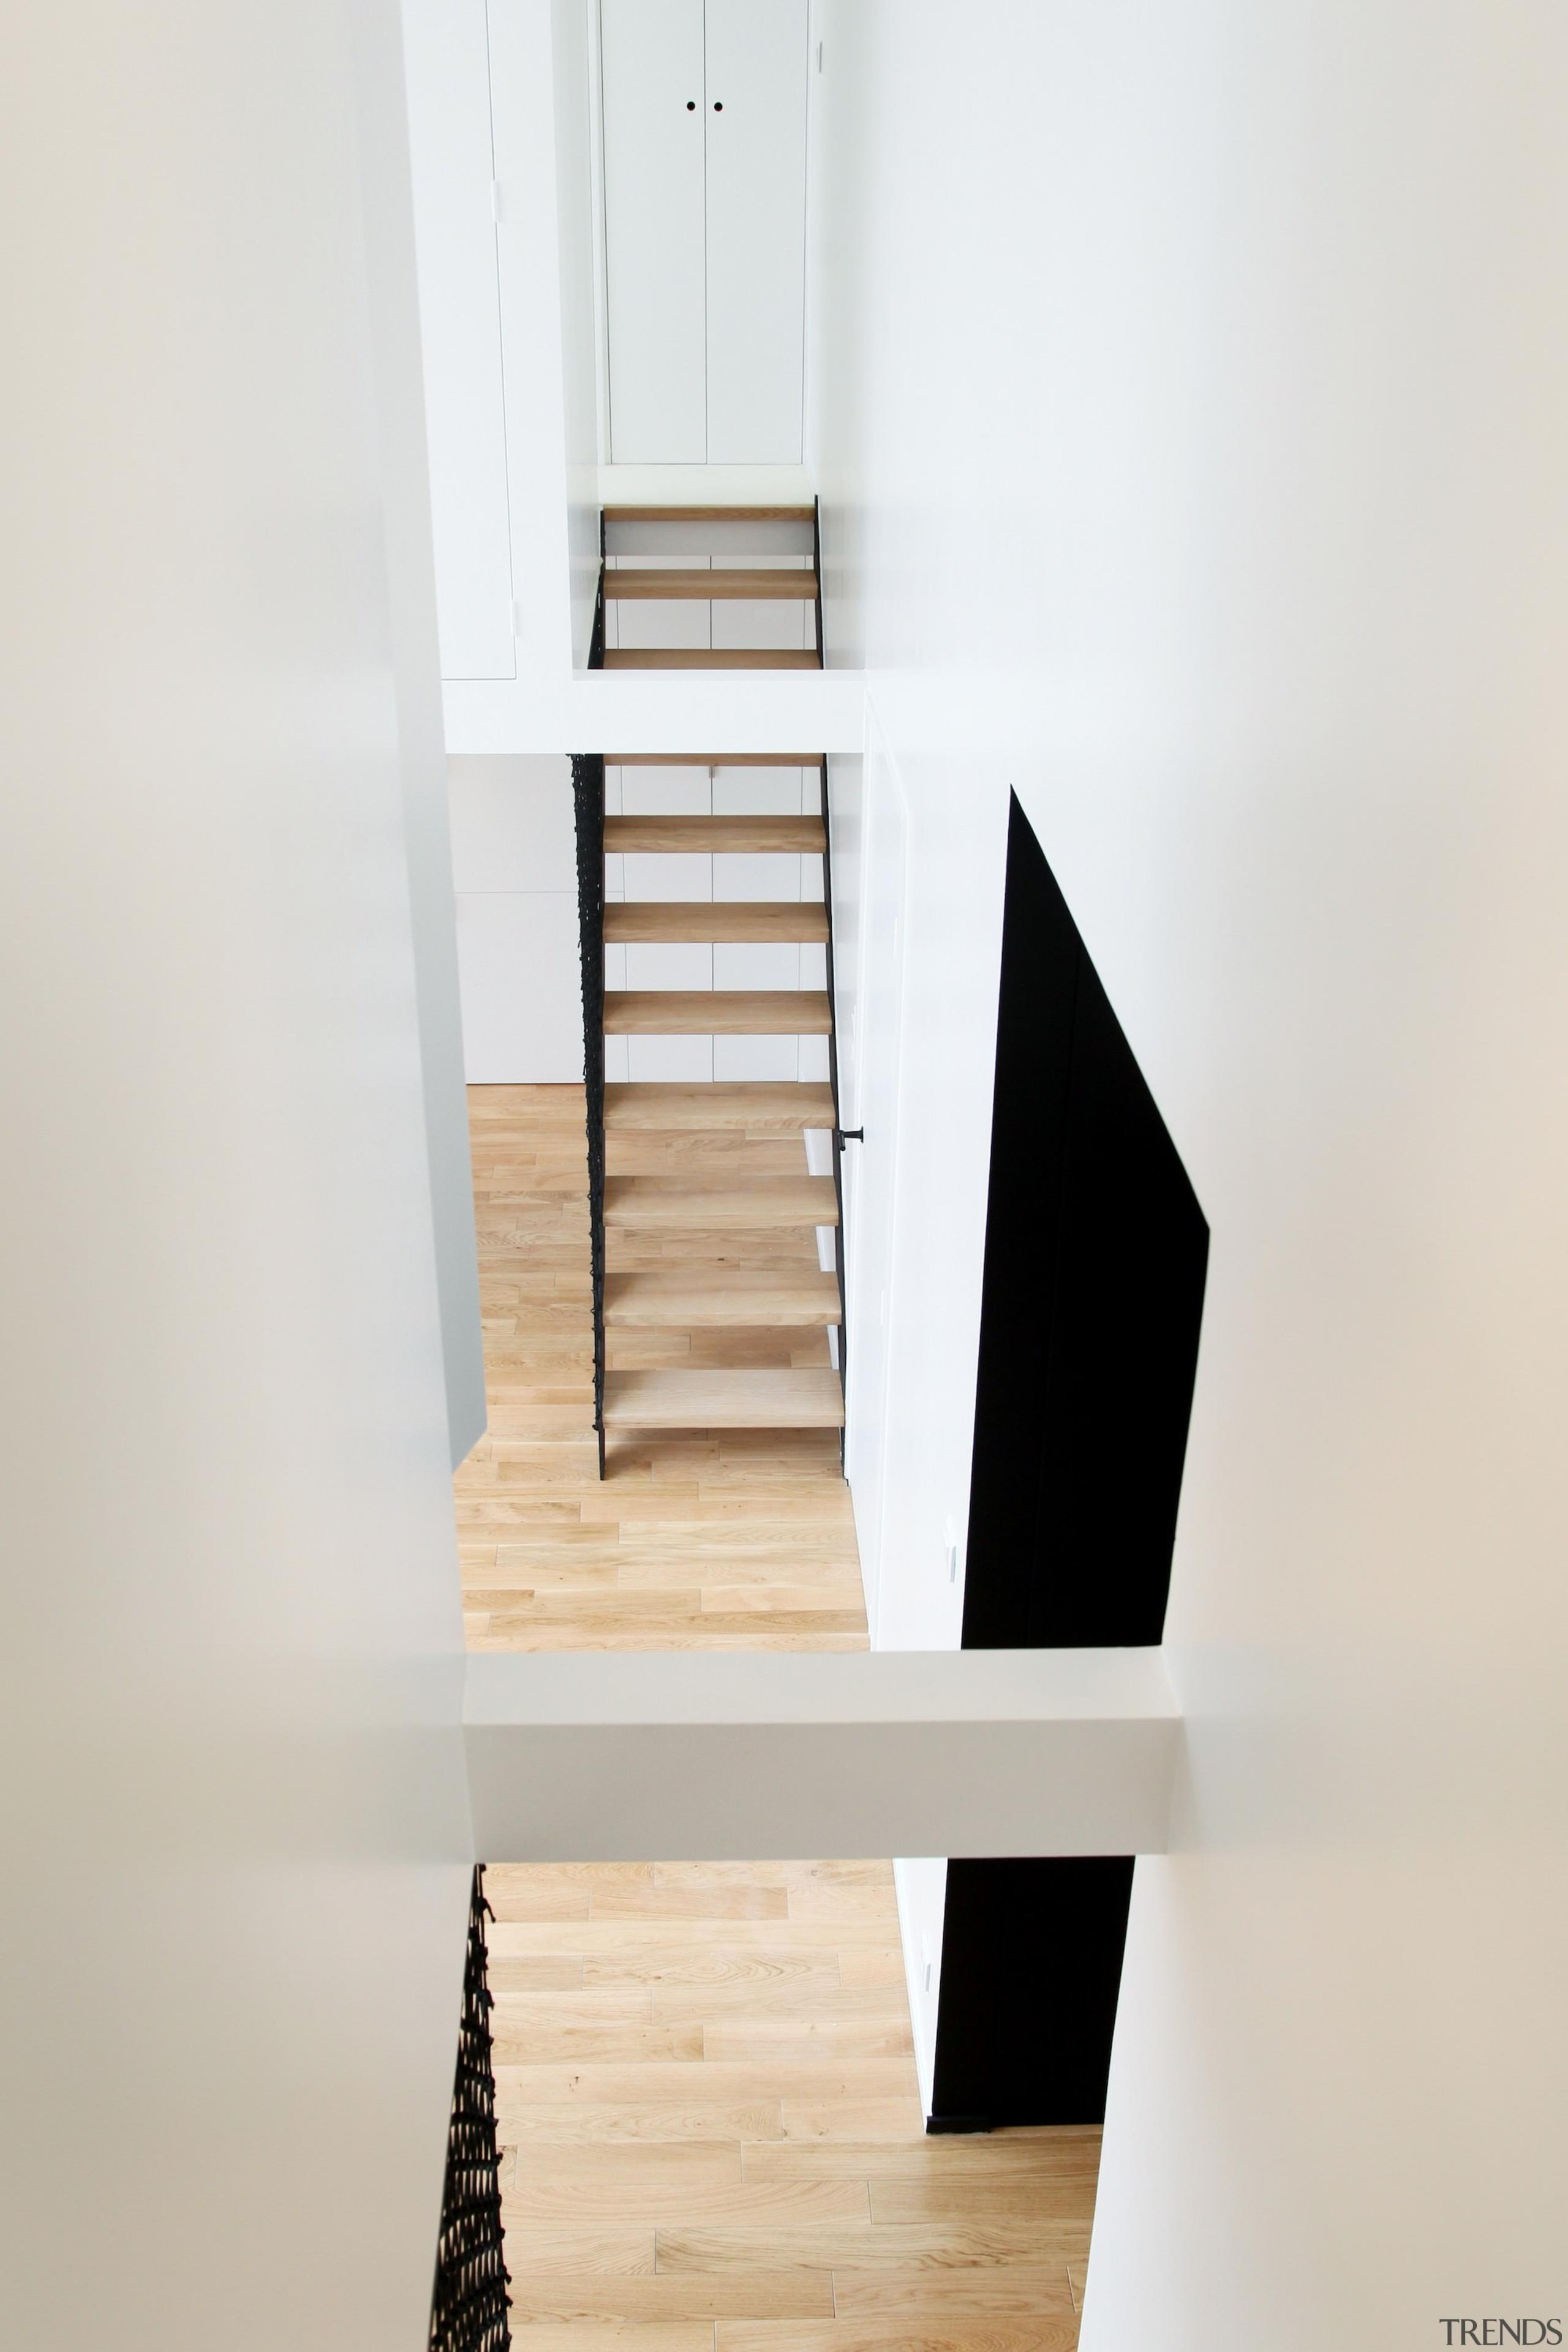 Architect: jbmn architectesPhotographer: Hermann Wendler furniture, product design, shelf, shelving, stairs, wood, white